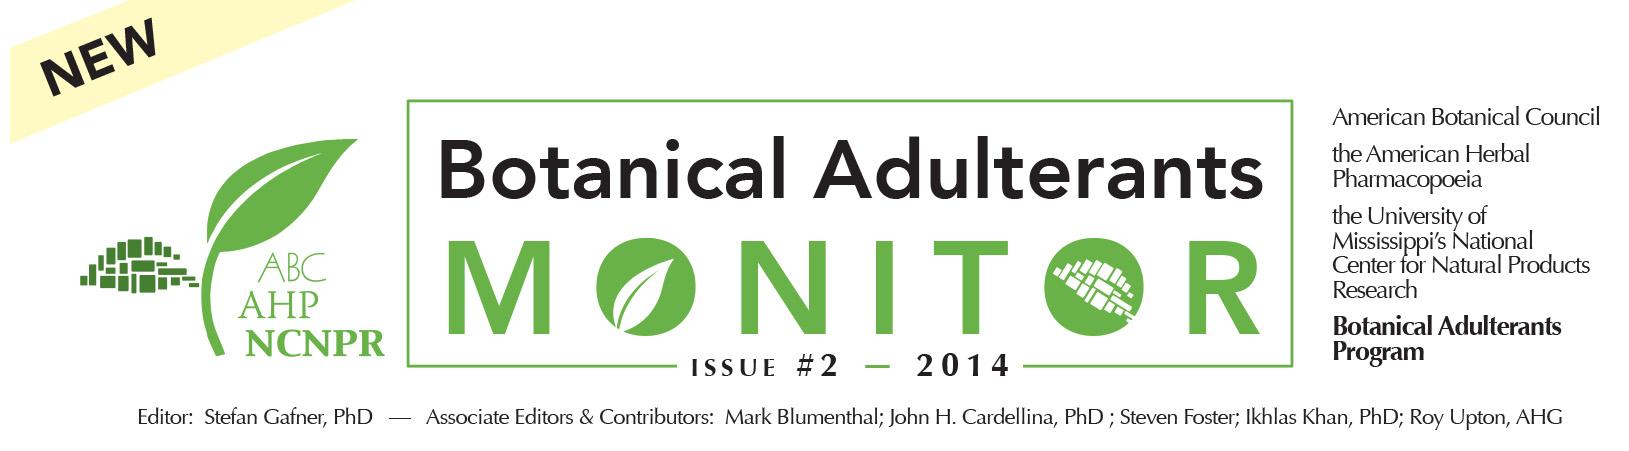 Botanical Adulterants Monitor Issue 2